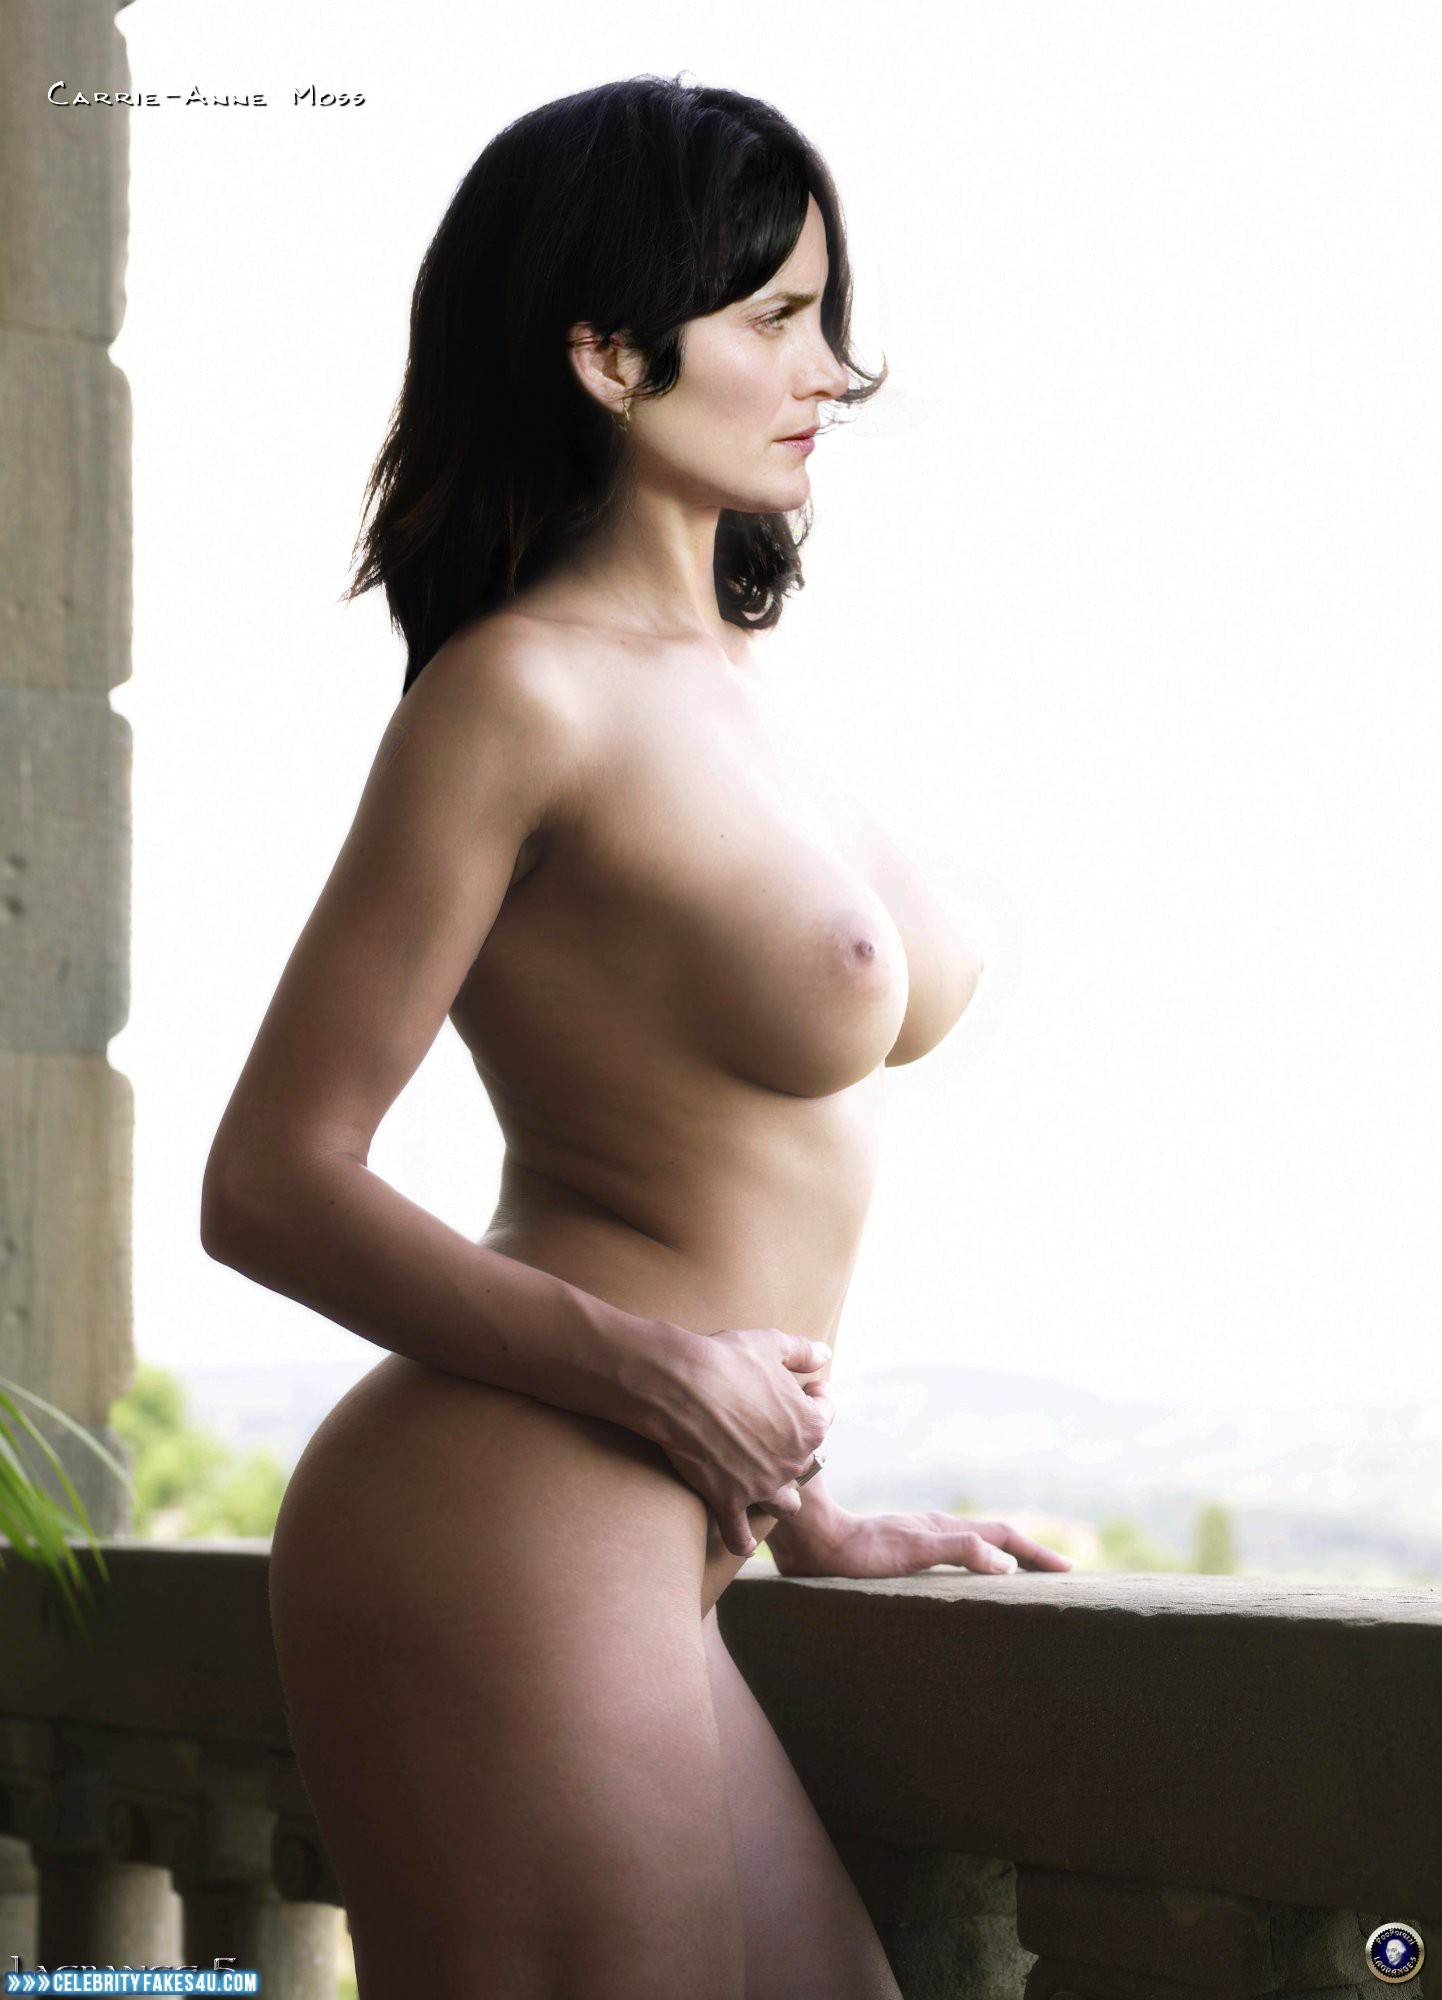 N big tits